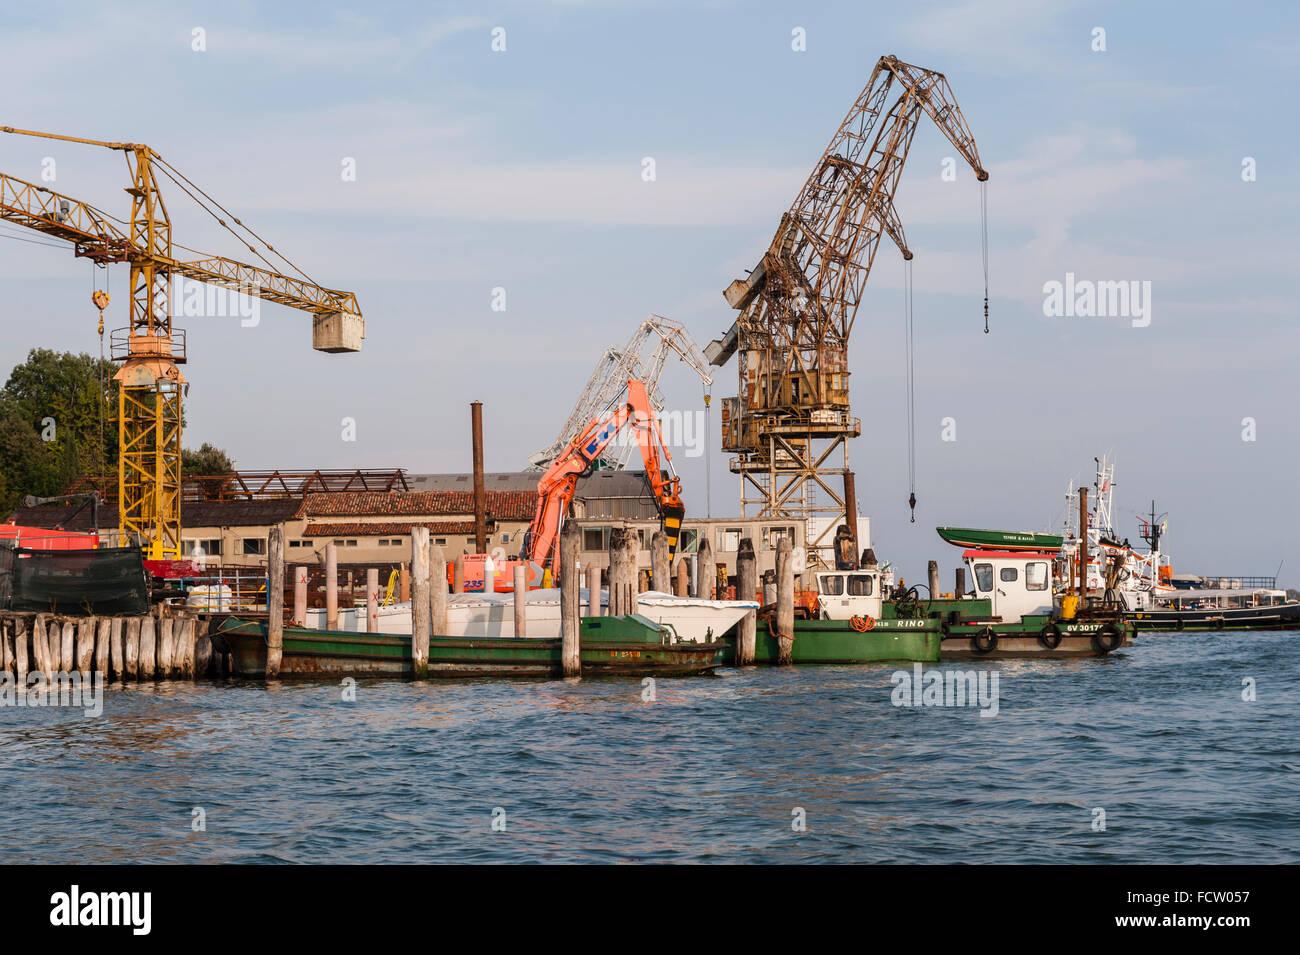 Venice, Italy. A boatyard on the Giudecca - Stock Image